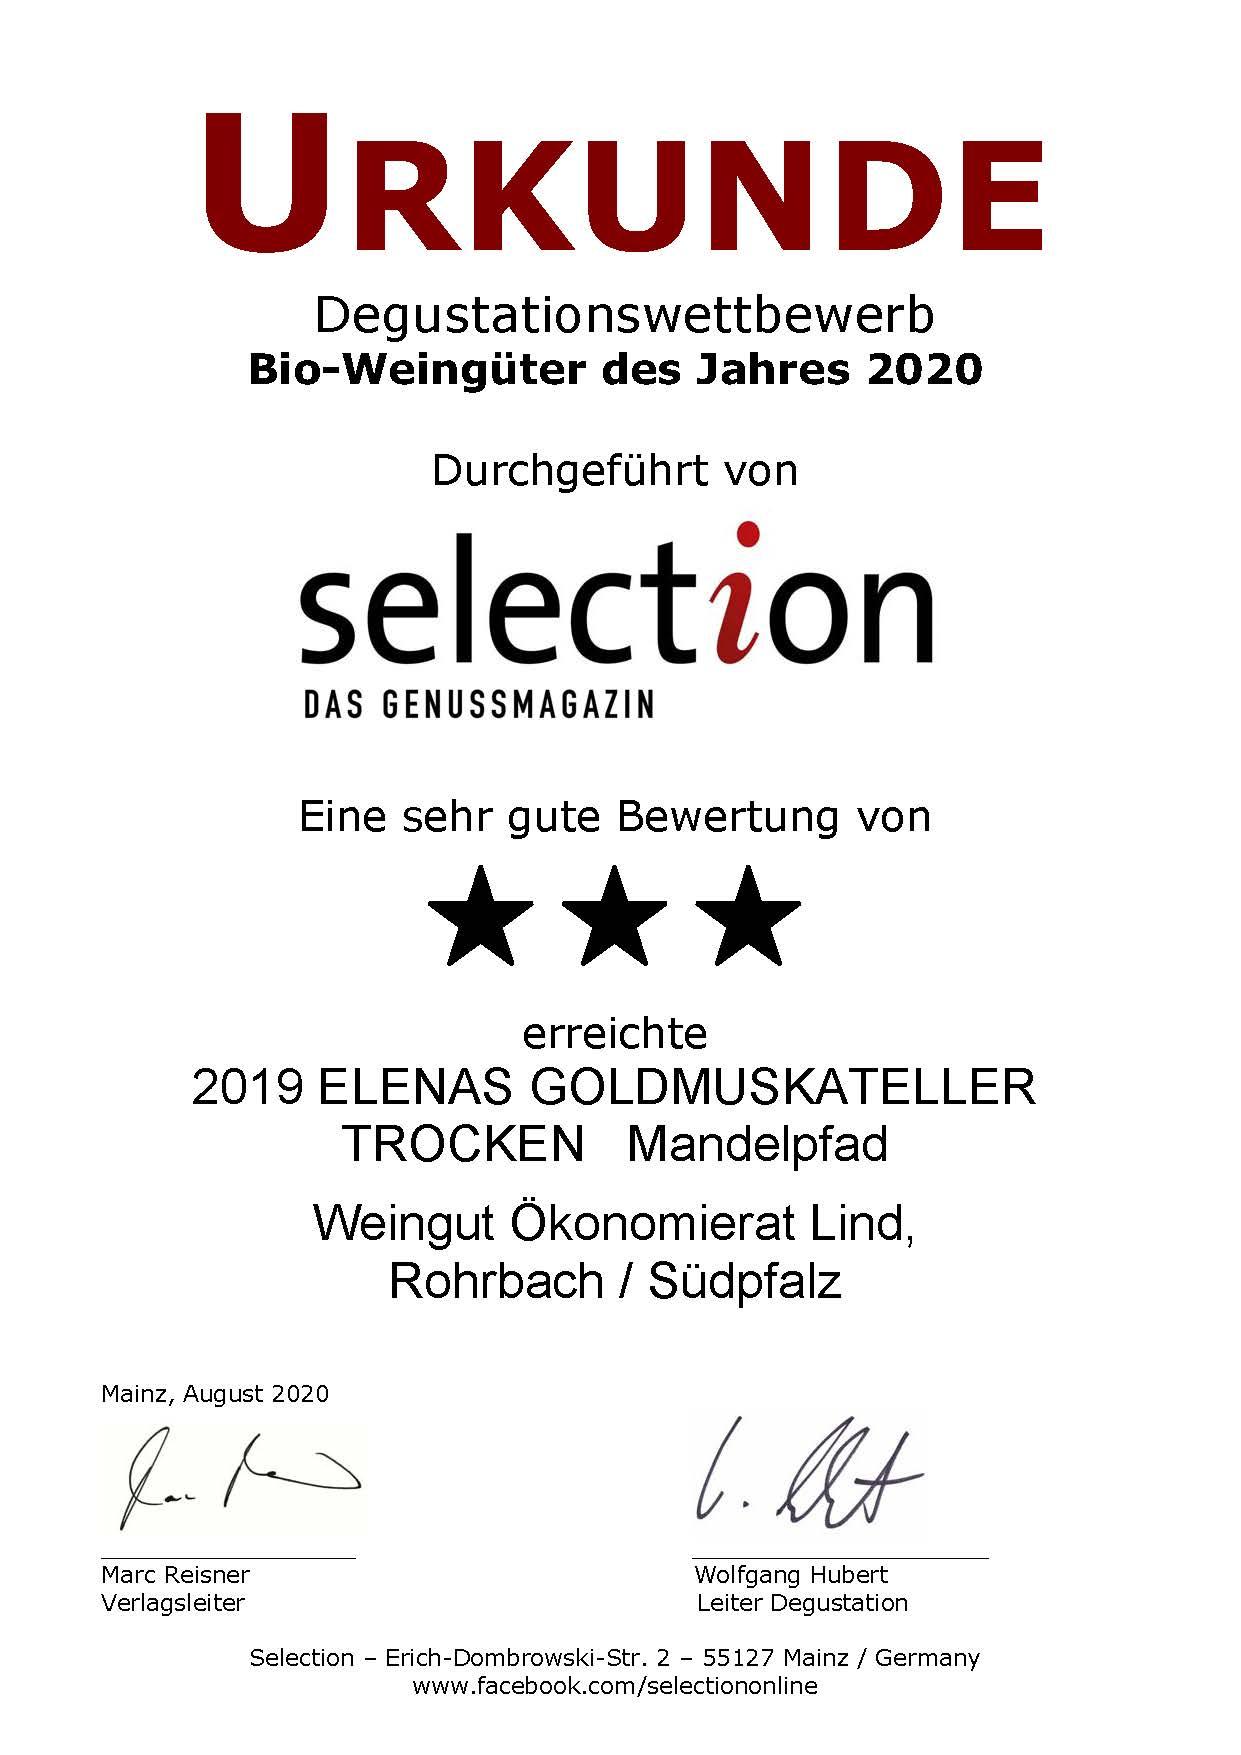 Nr. 01 - ELENAS GOLDMUSKATELLER TROCKEN - 3 Sterne